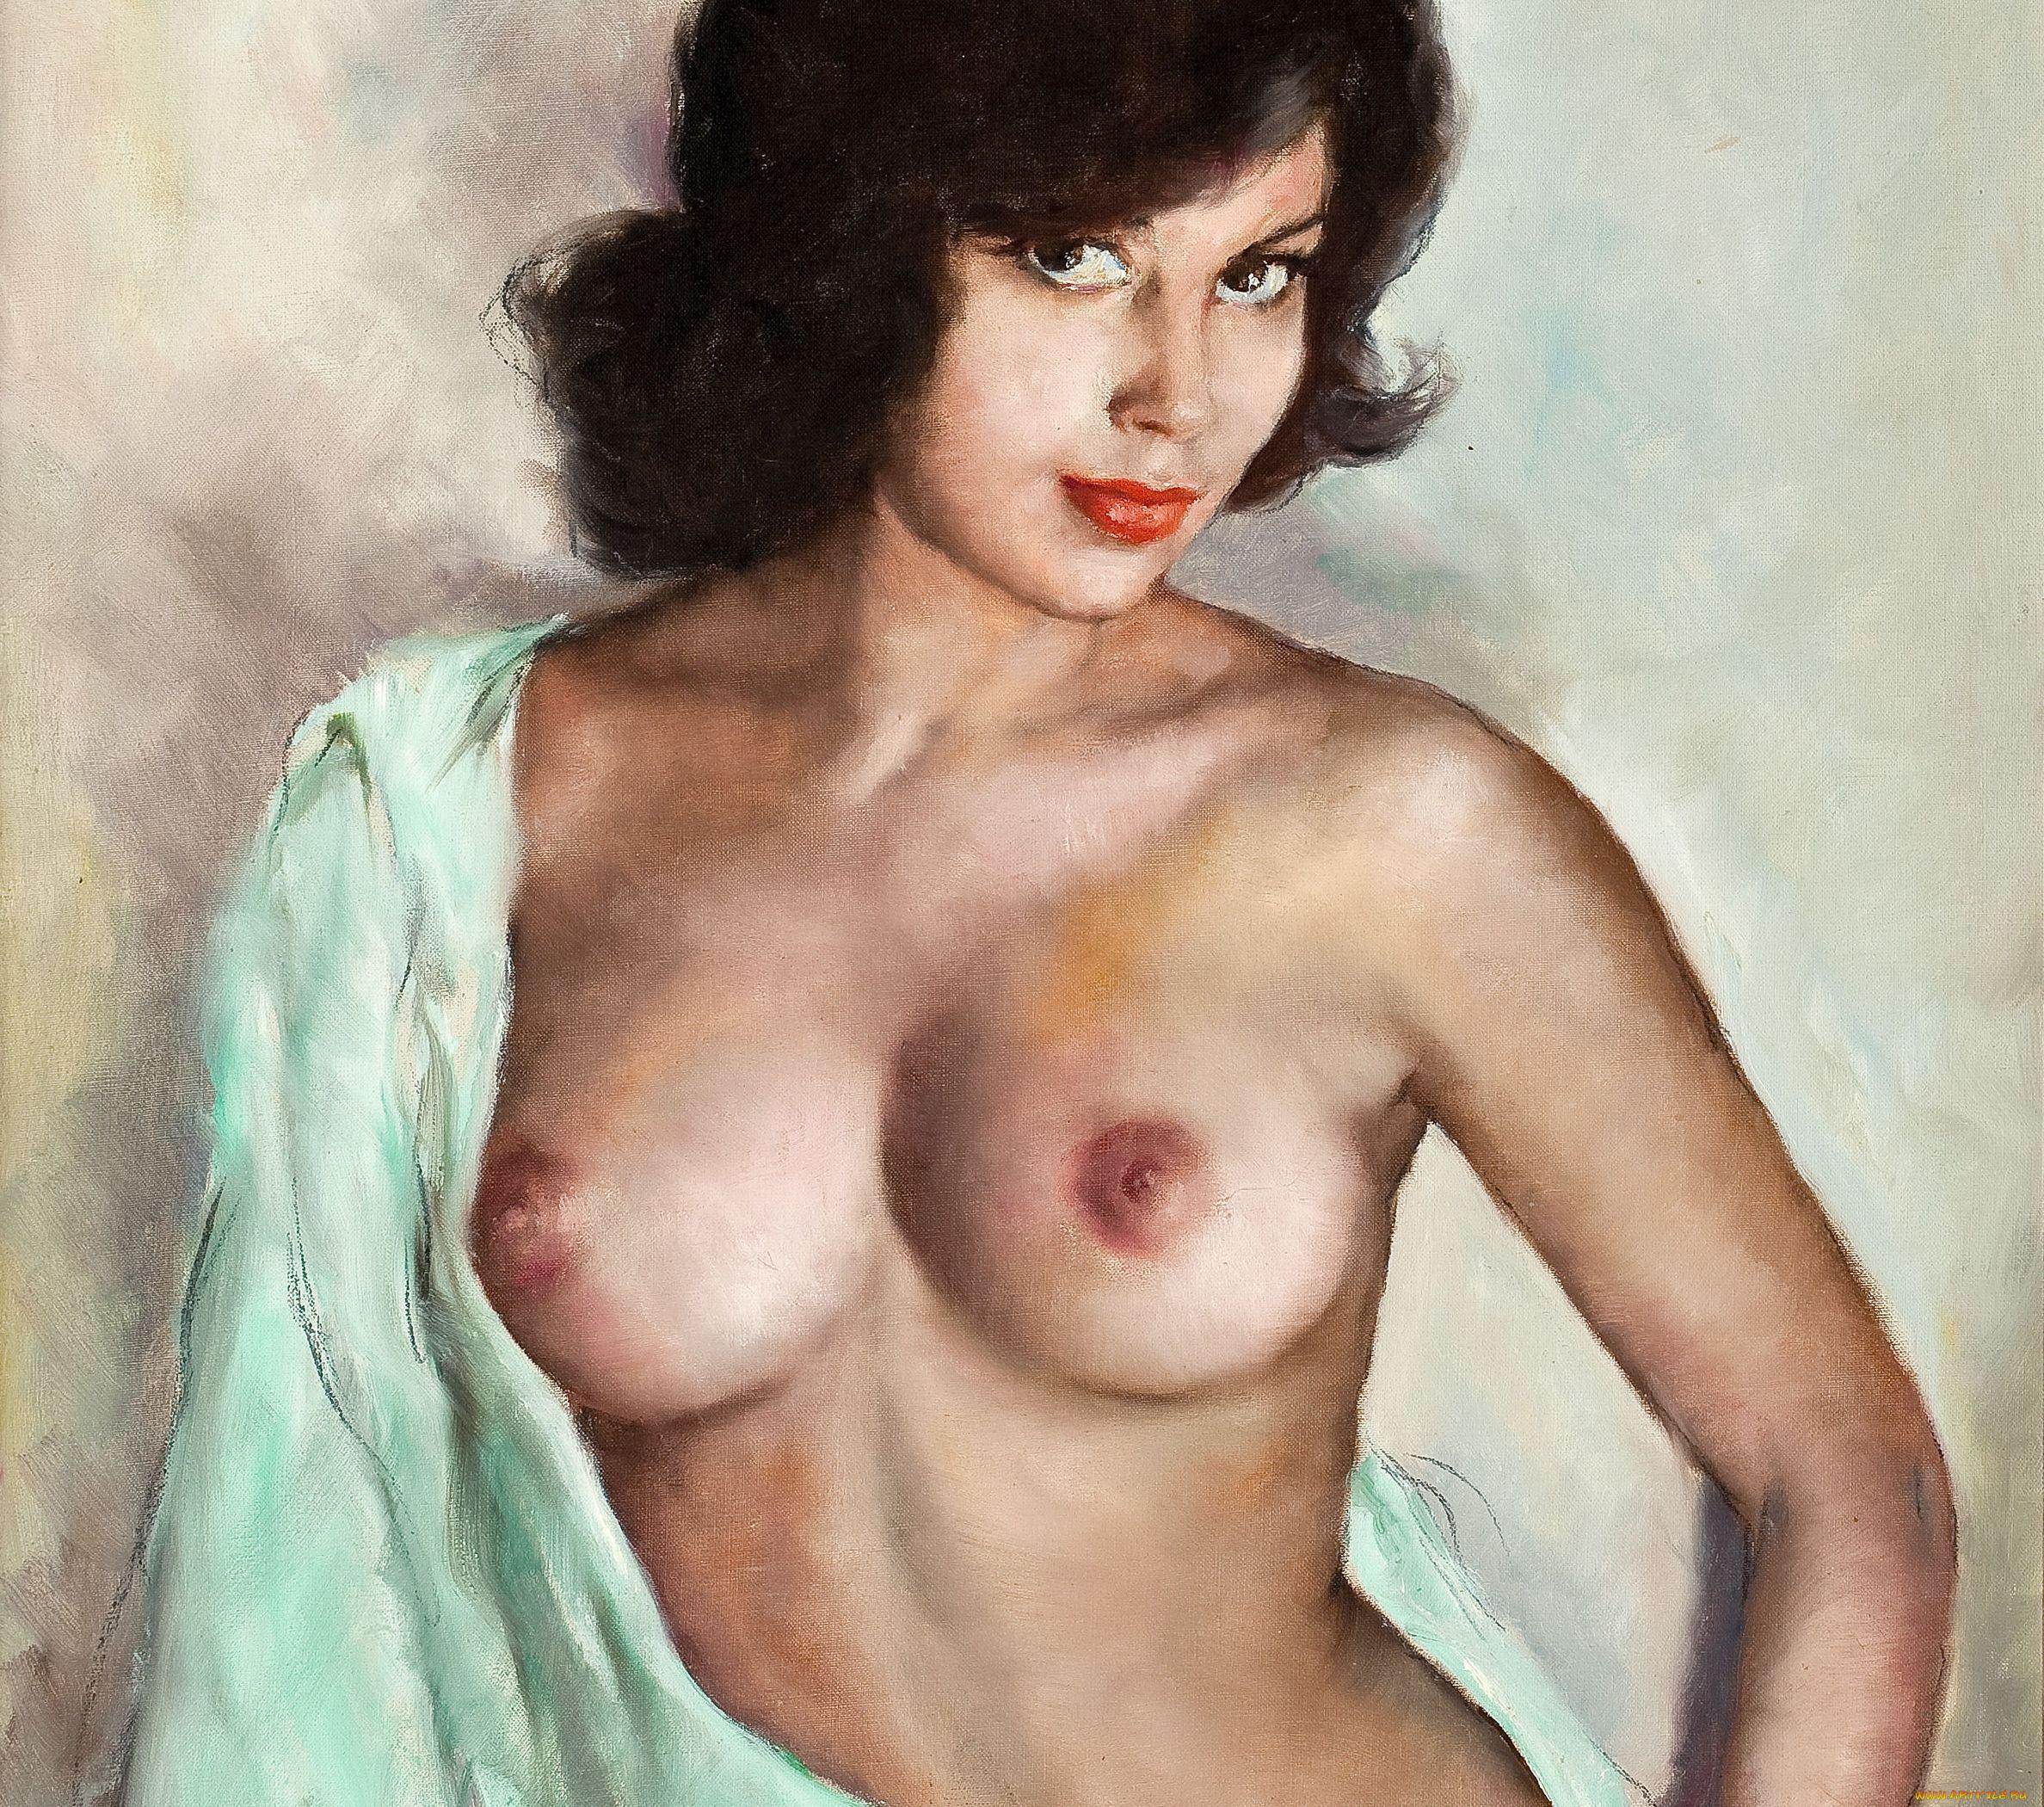 foto-eroticheskie-portreti-devushek